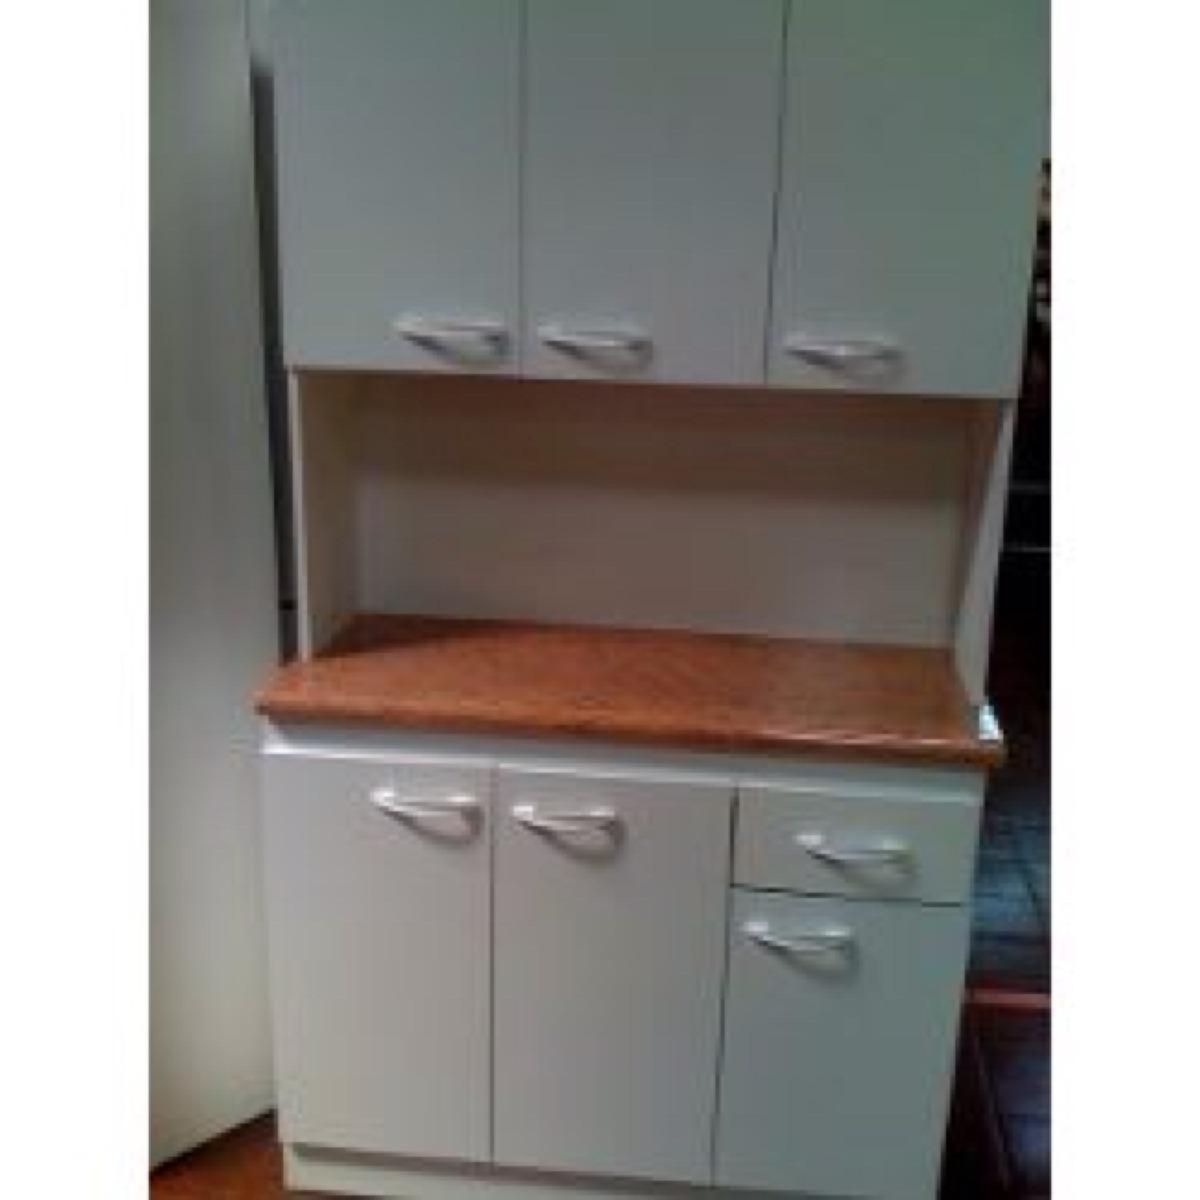 Mueble cocina compacto en mercado libre for Muebles de cocina 2 metros